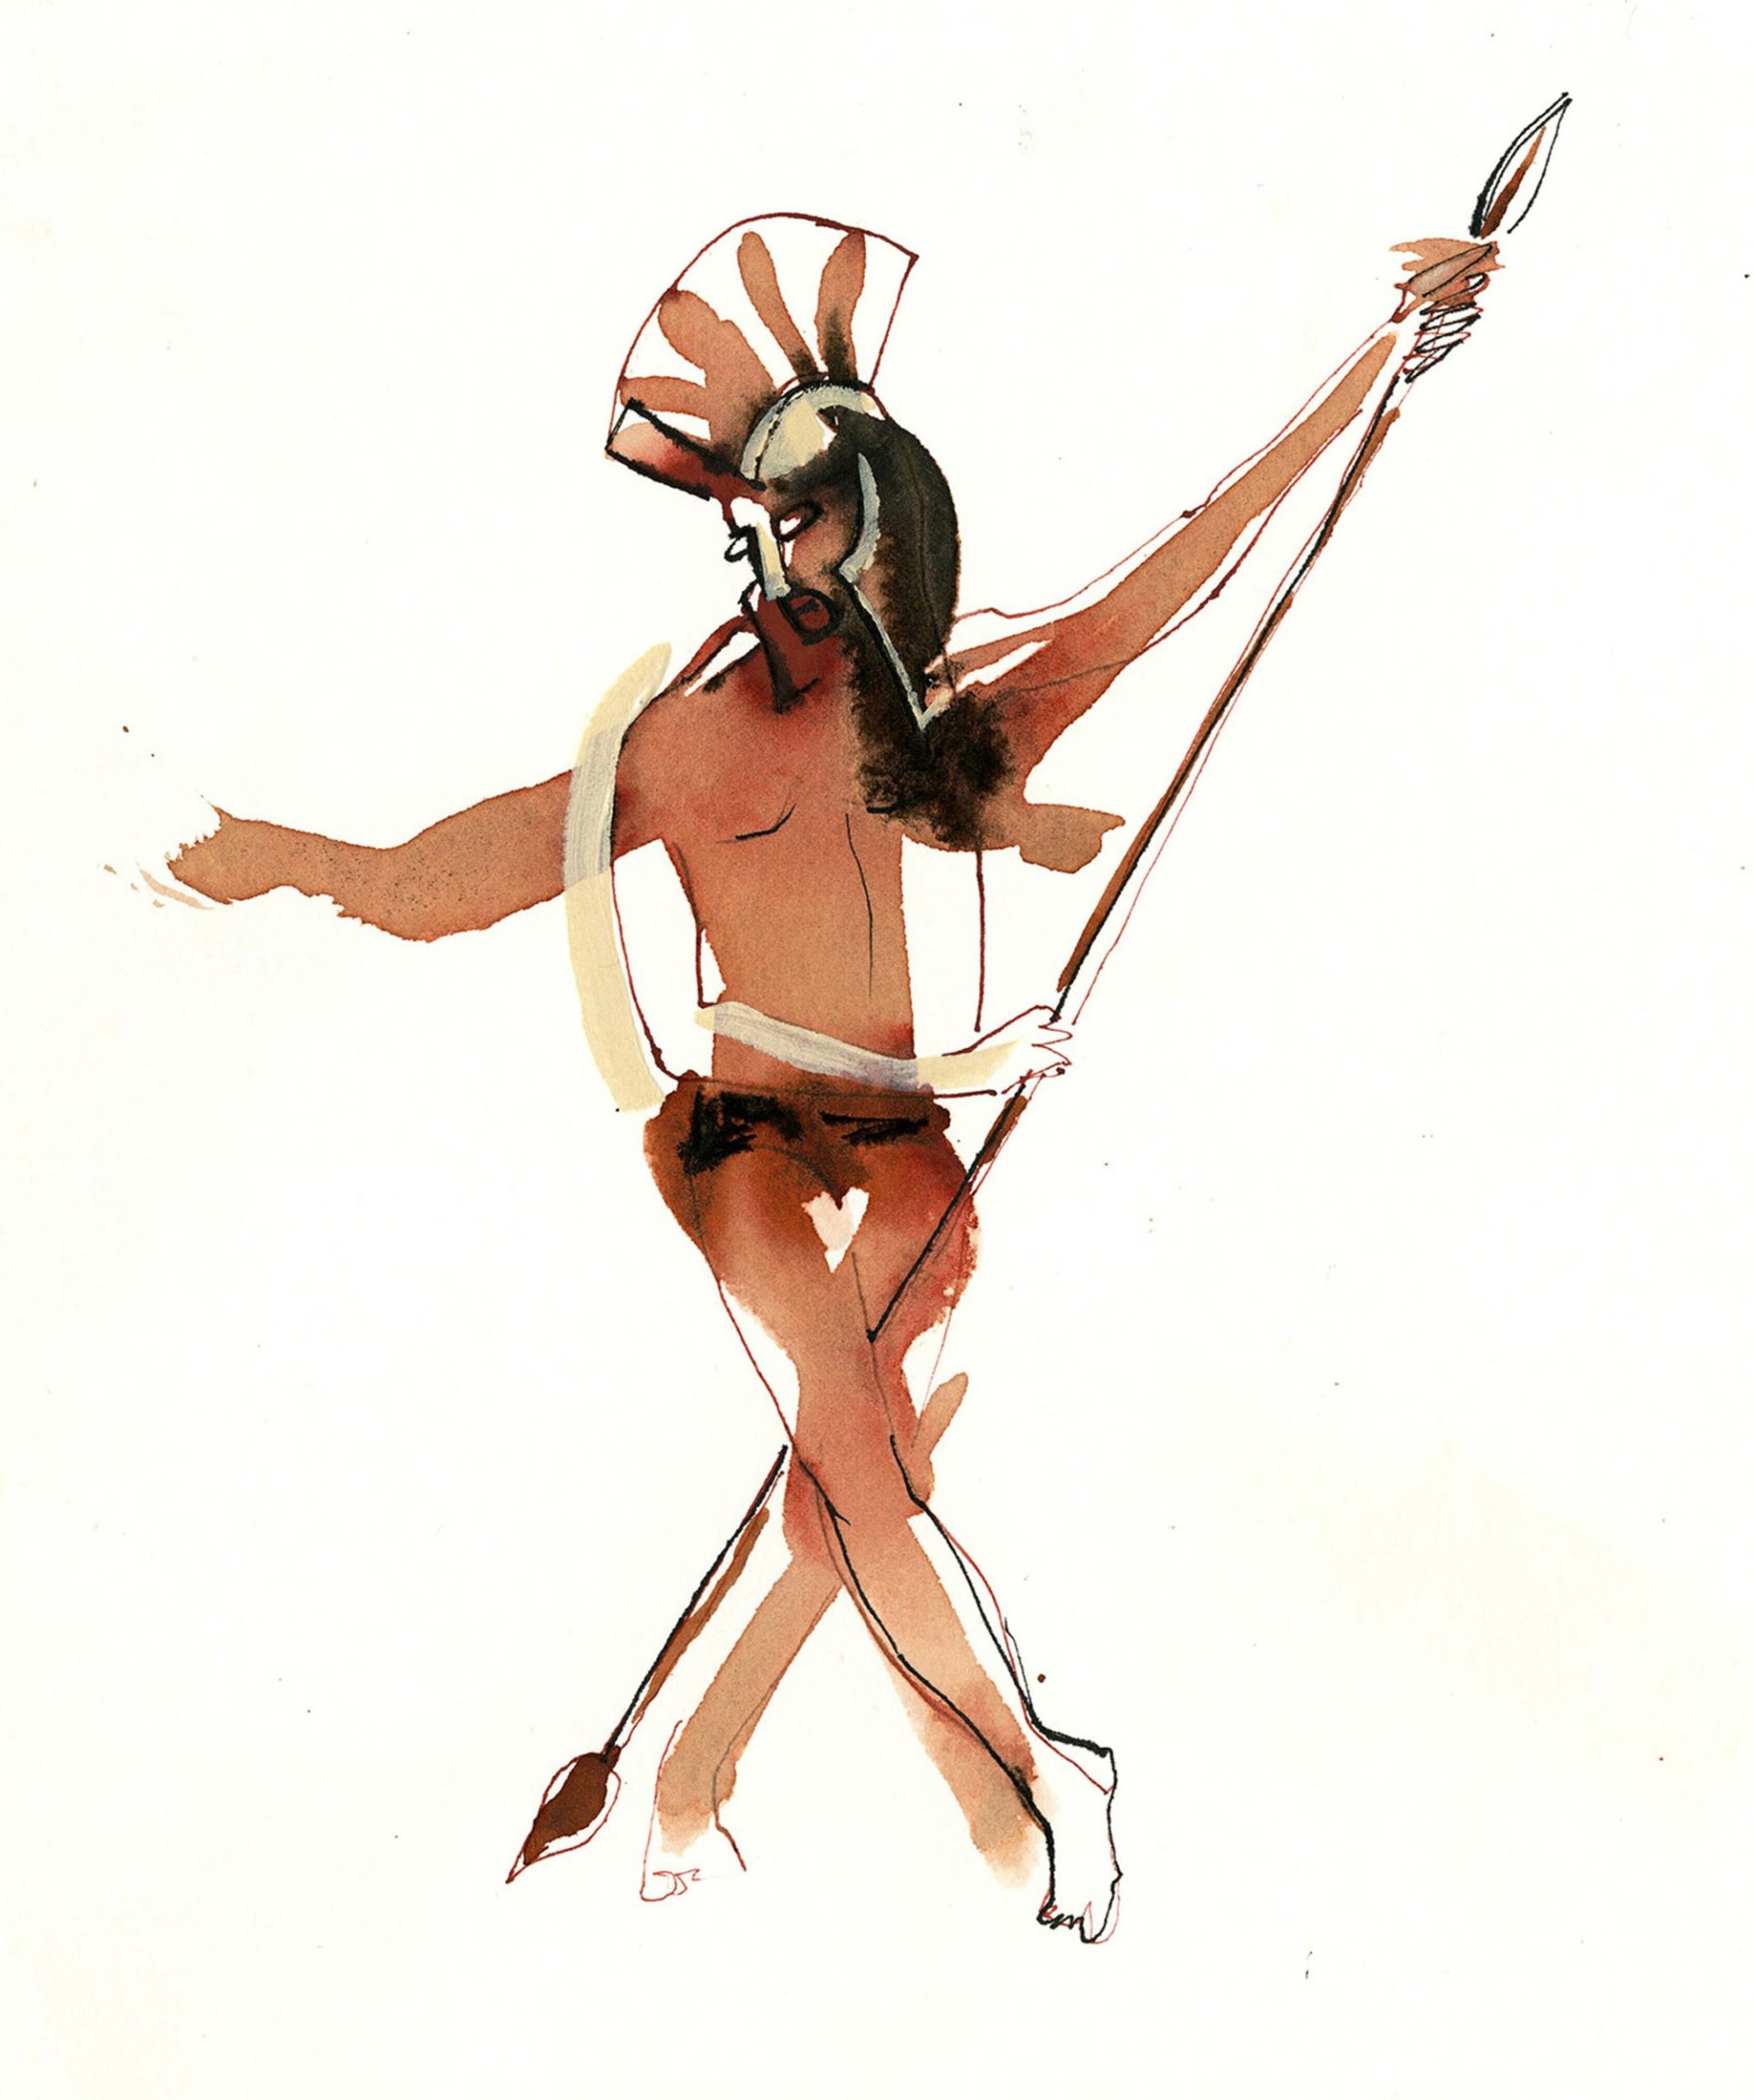 "<span class=""link fancybox-details-link""><a href=""/artists/150-julia-midgley/works/12532-julia-midgley-dancing-roman/"">View Detail Page</a></span><div class=""artist""><span class=""artist""><strong>Julia Midgley</strong></span></div><div class=""title""><em>Dancing Roman</em></div><div class=""medium"">watercolour & ink</div><div class=""dimensions"">Frame: 35 x 45cm<br /> Artwork: 26 x 30cm</div><div class=""price"">£360.00</div>"